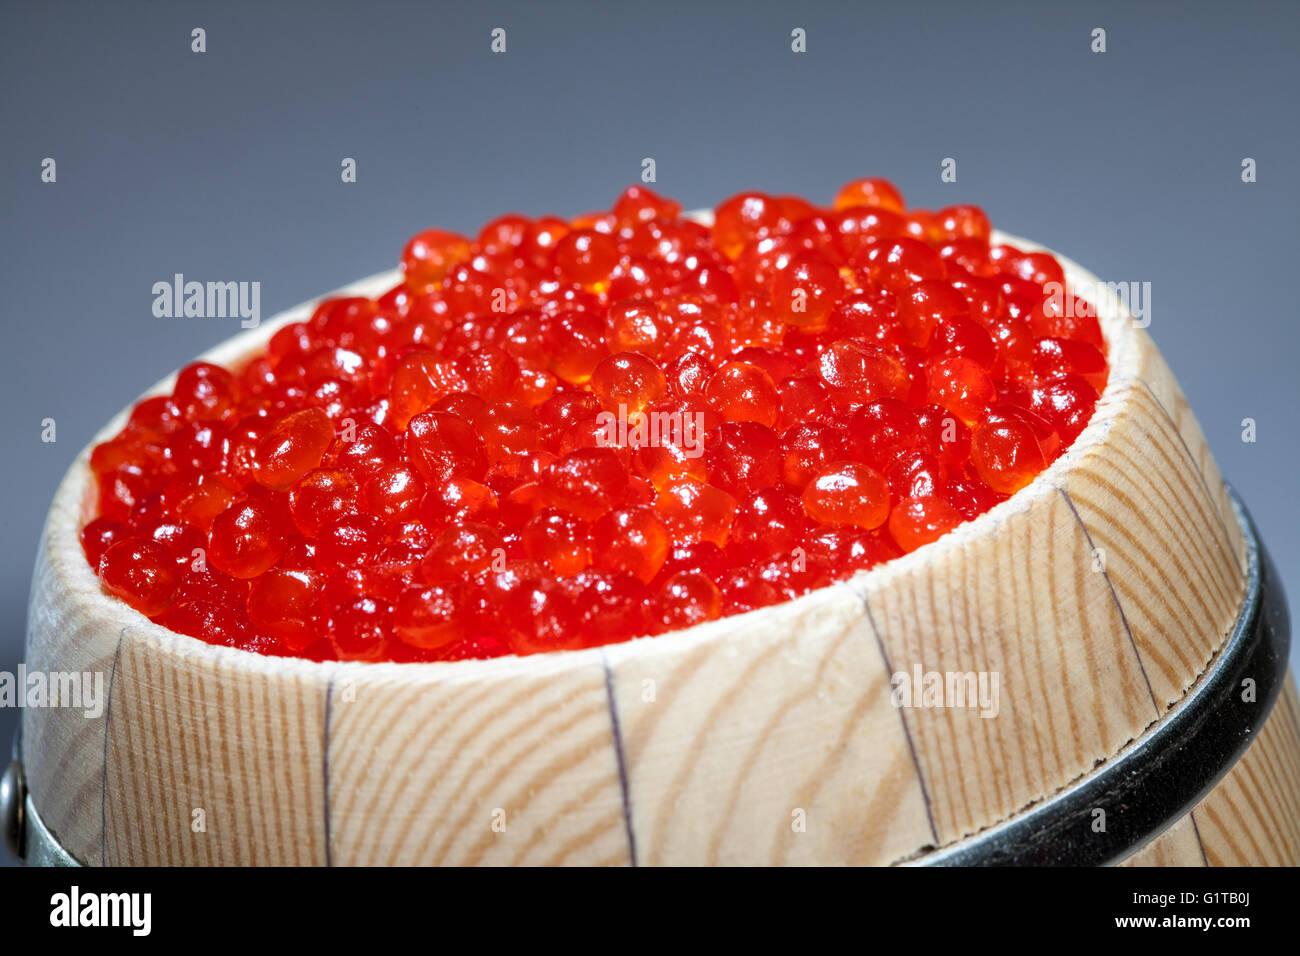 Keg of red caviar on the dark - Stock Image